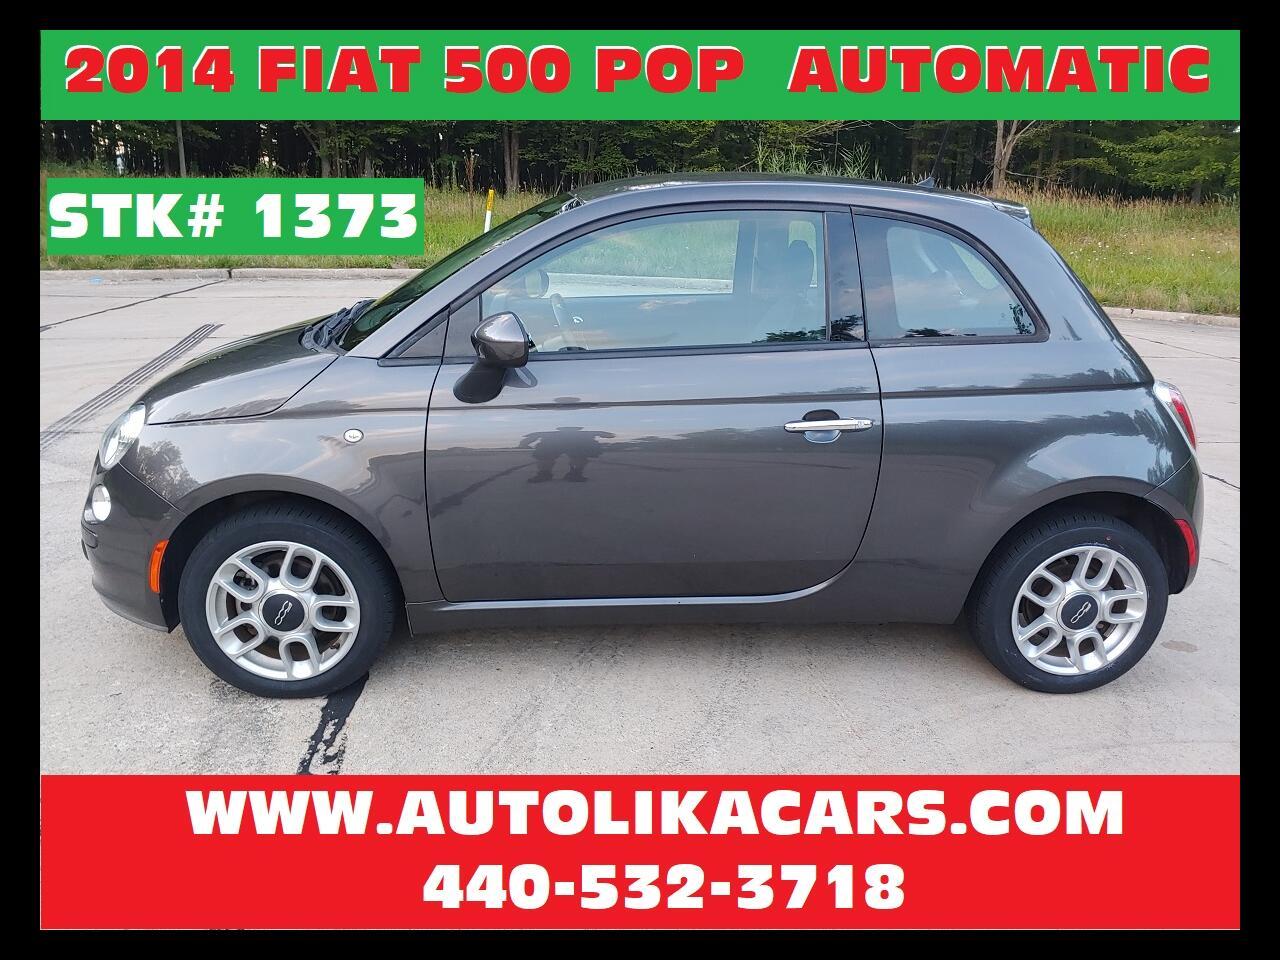 2014 Fiat 500 2dr HB Pop